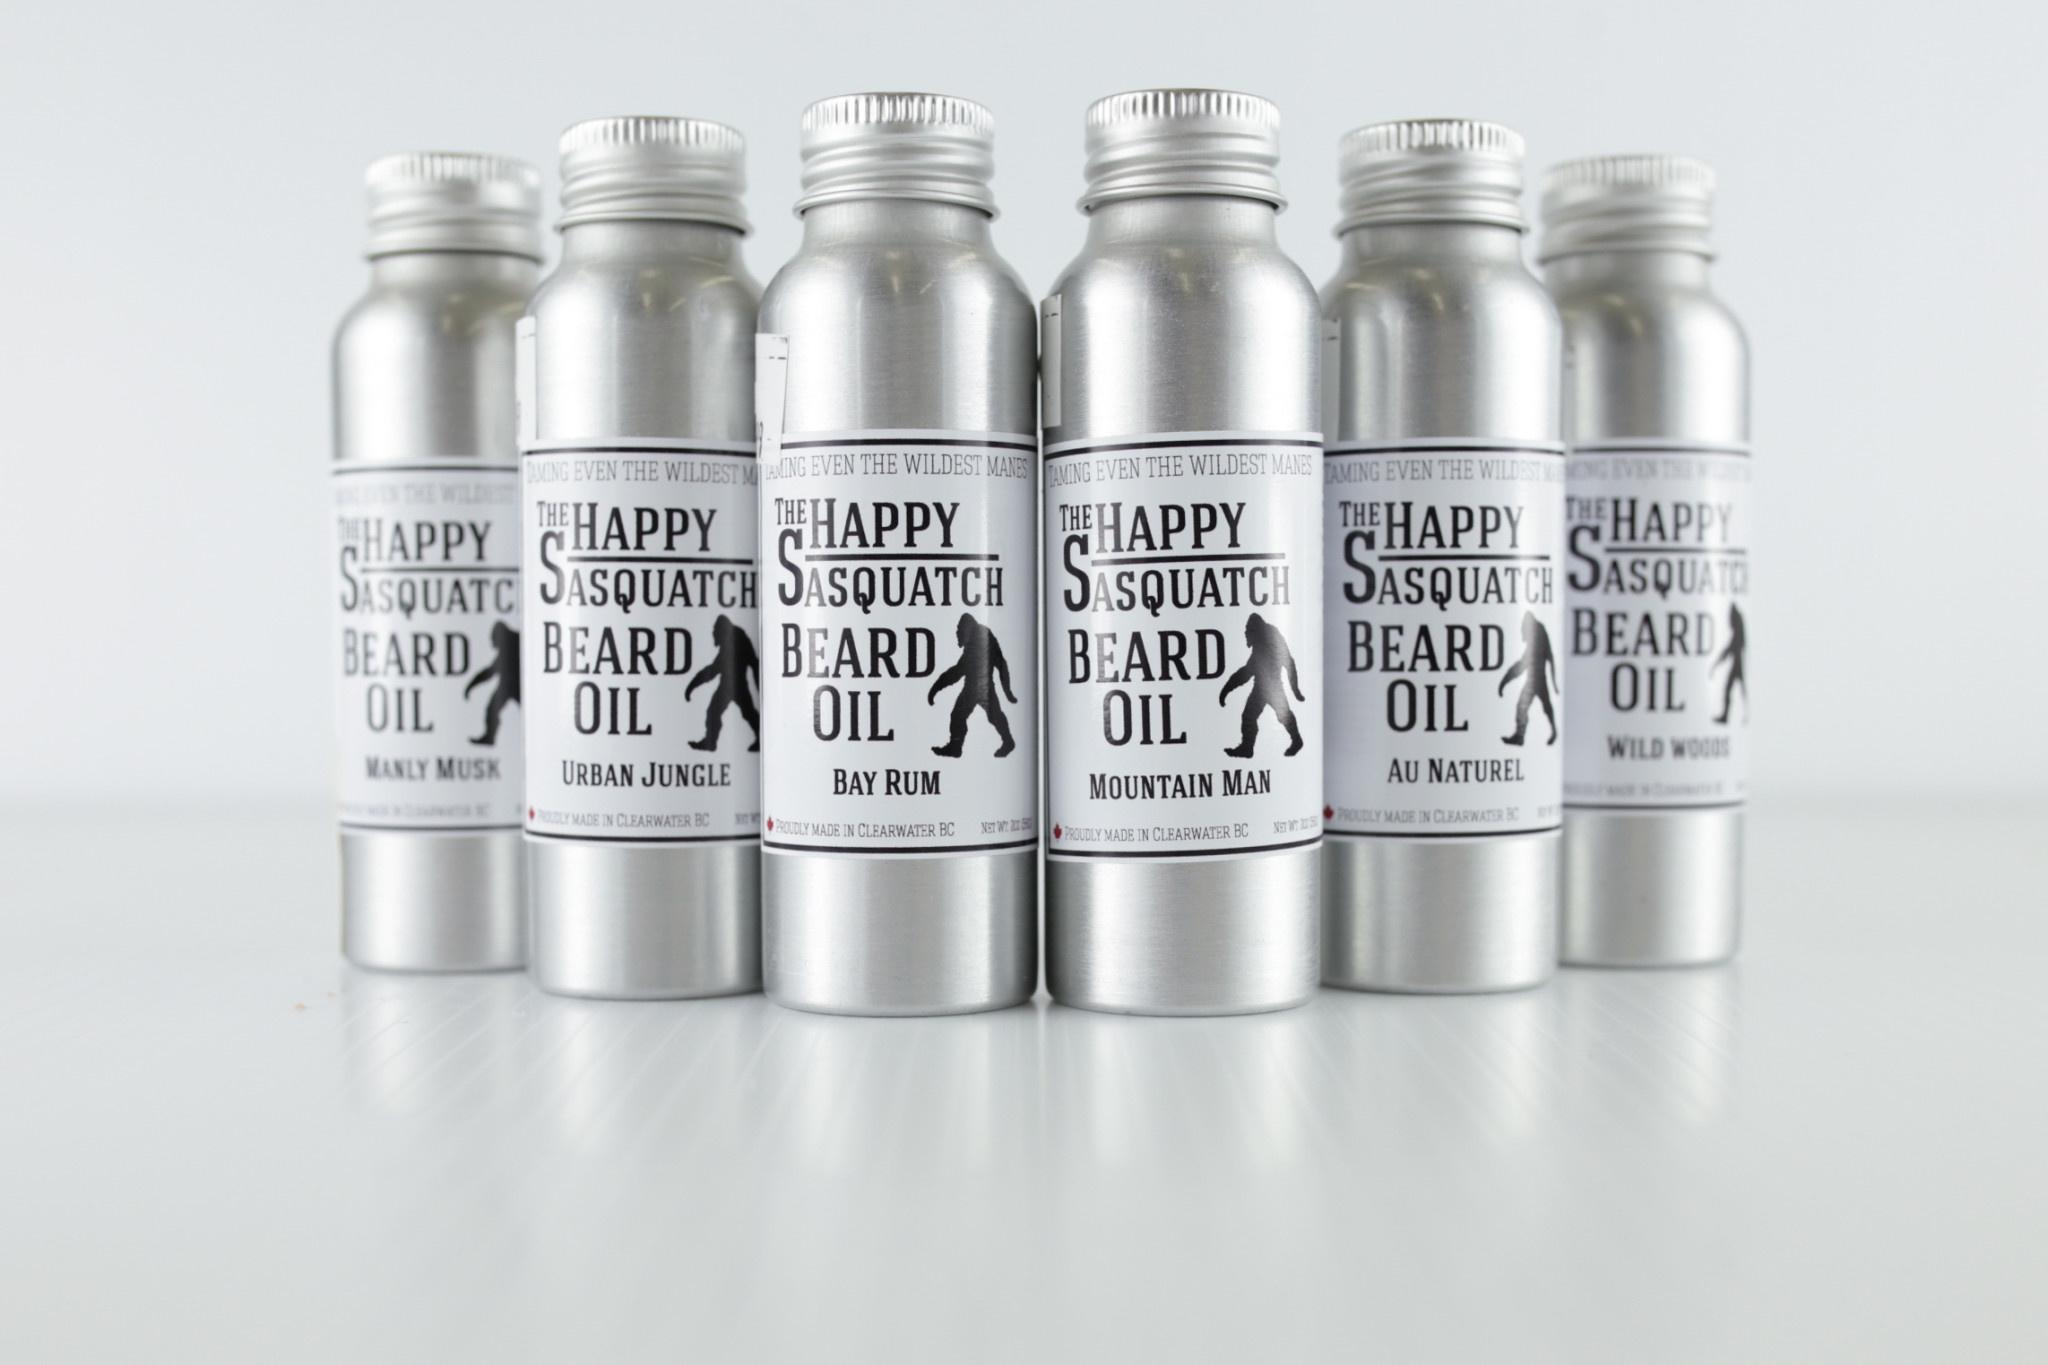 Happy Sasquatch Beard Oil Manly Musk